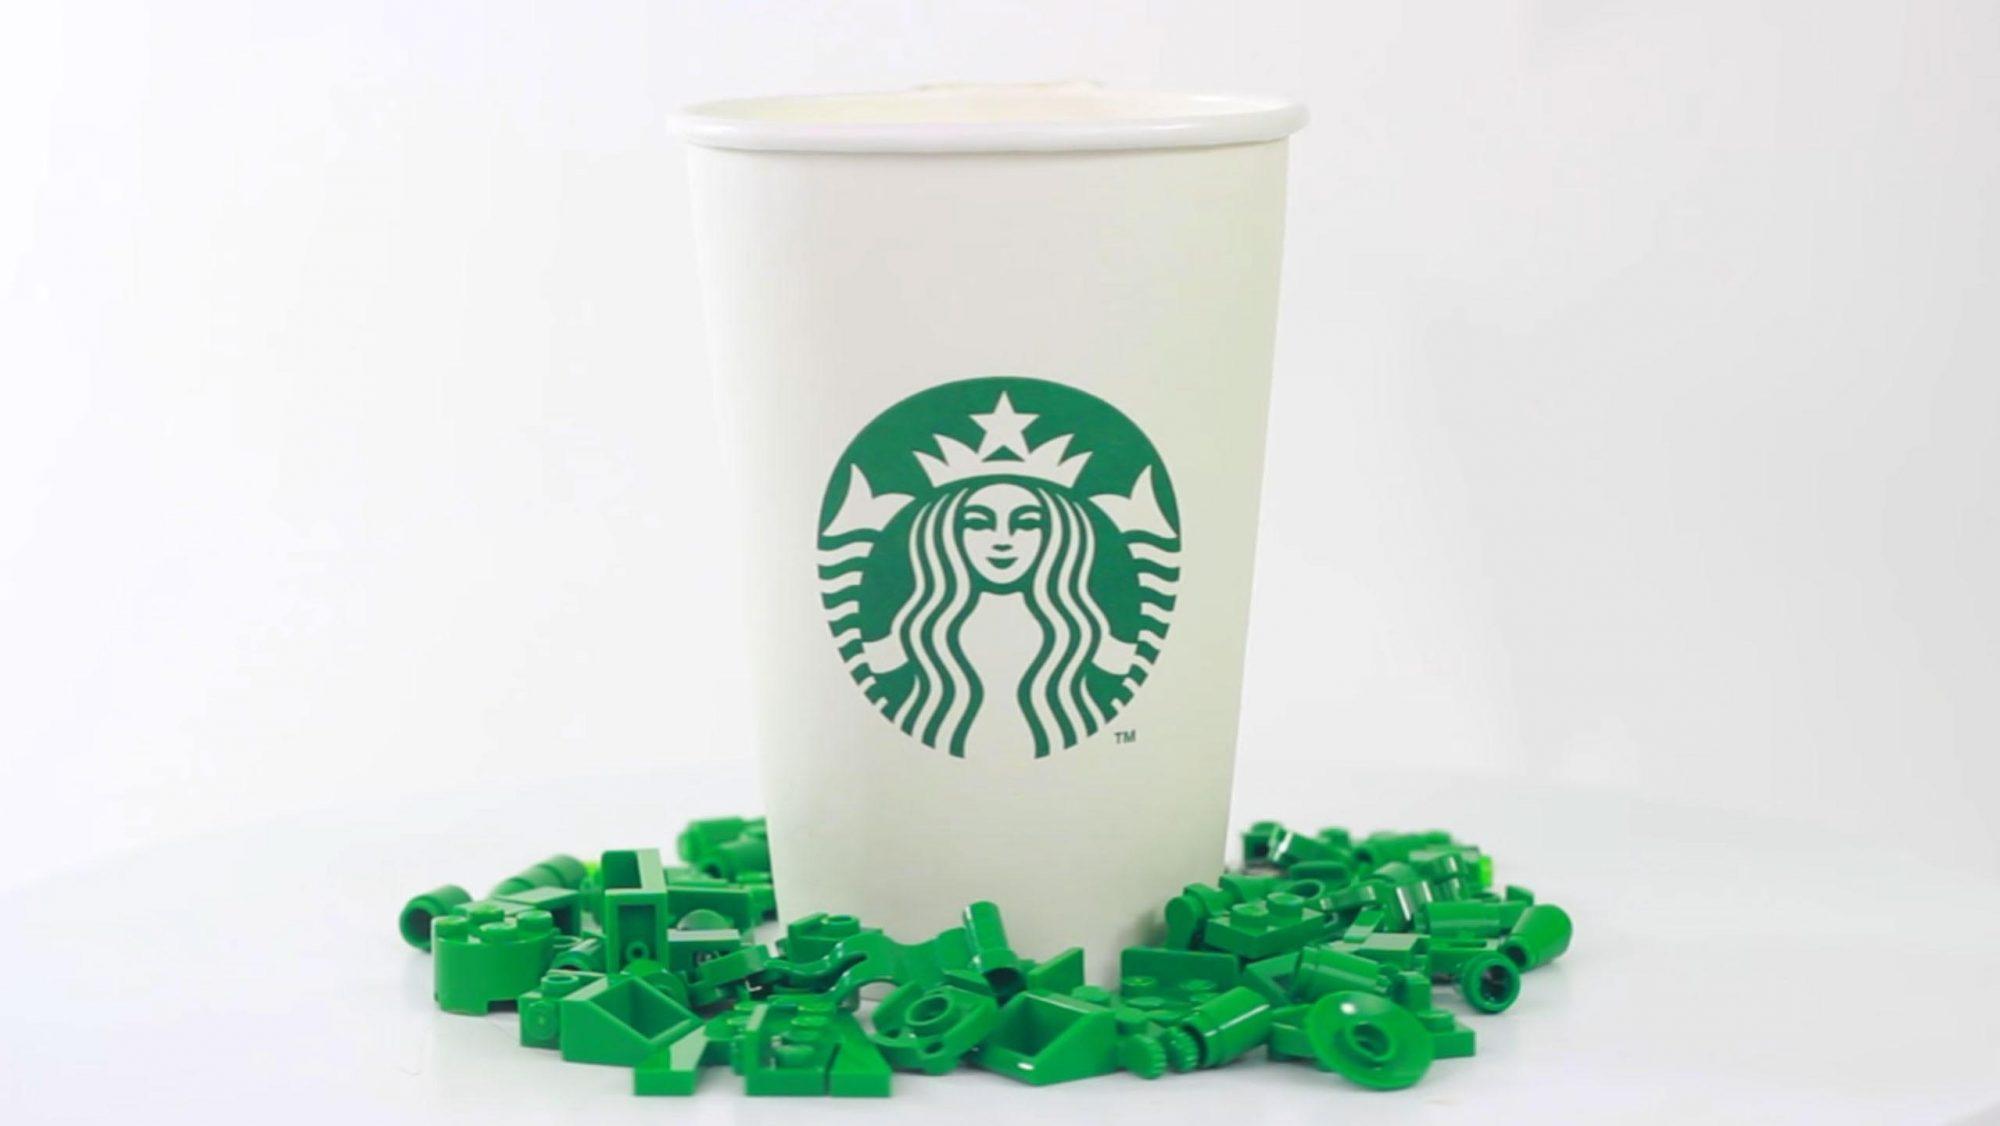 LEGO Starbucks